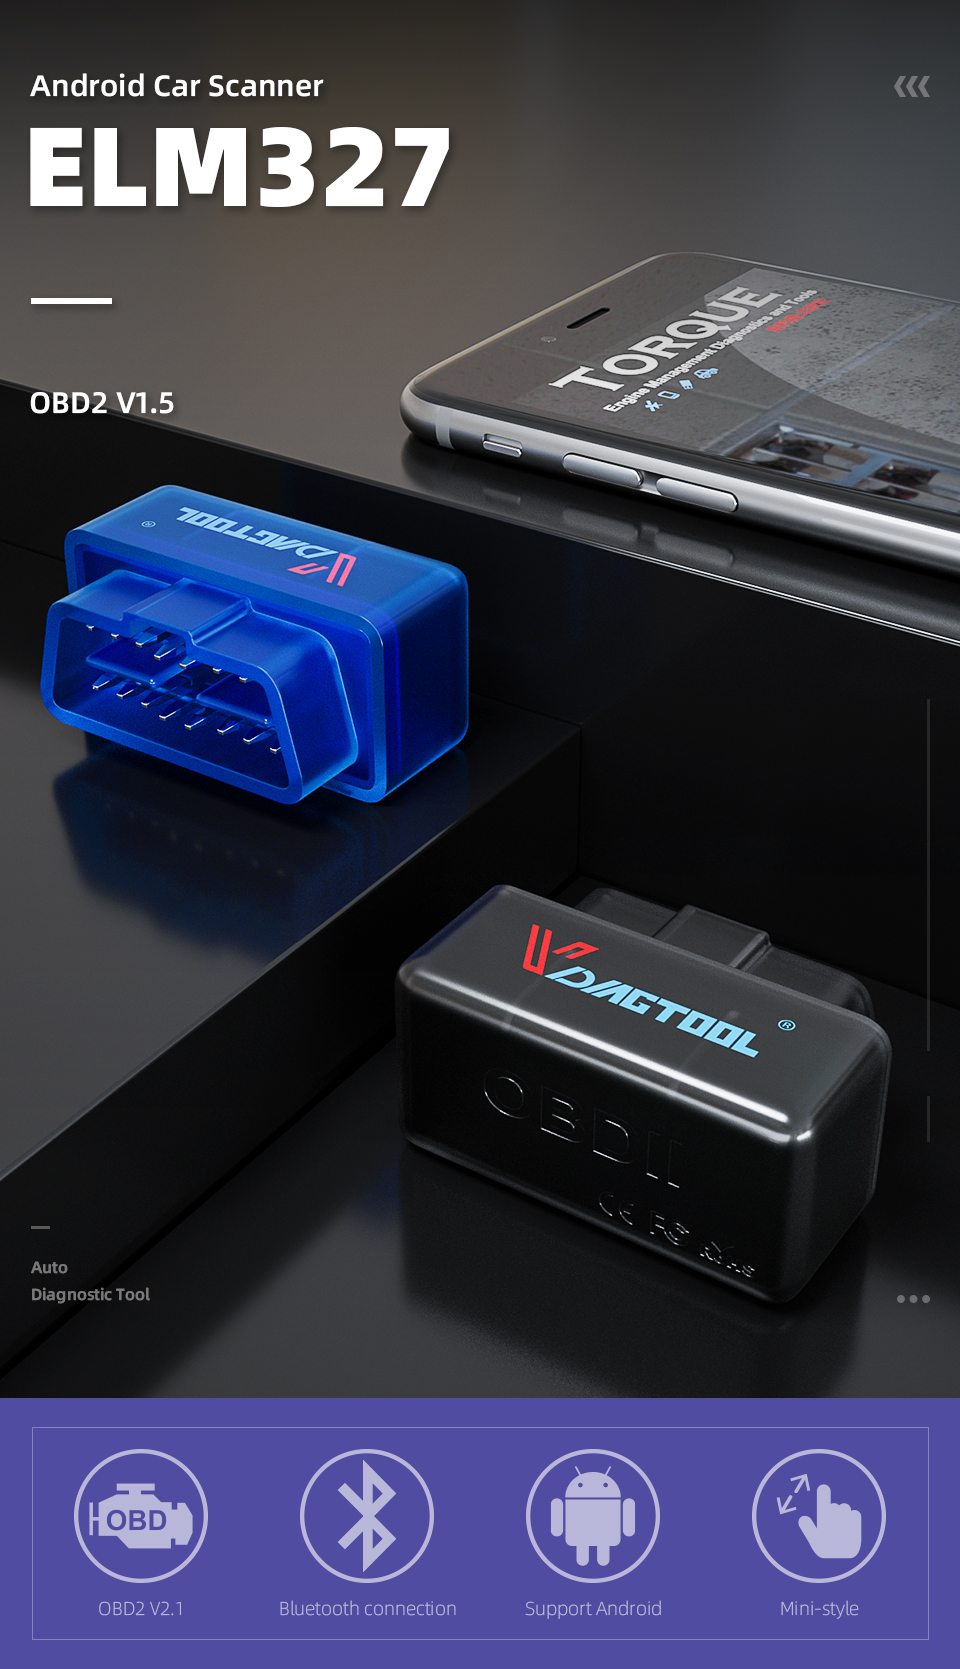 OBD2 Super MINI hhobd ELM327 Bluetooth V2.1V1.5 OBD2 Car Diagnostic Tool ELM 327 OBD Auto Scanner Code Reader For Android Torque